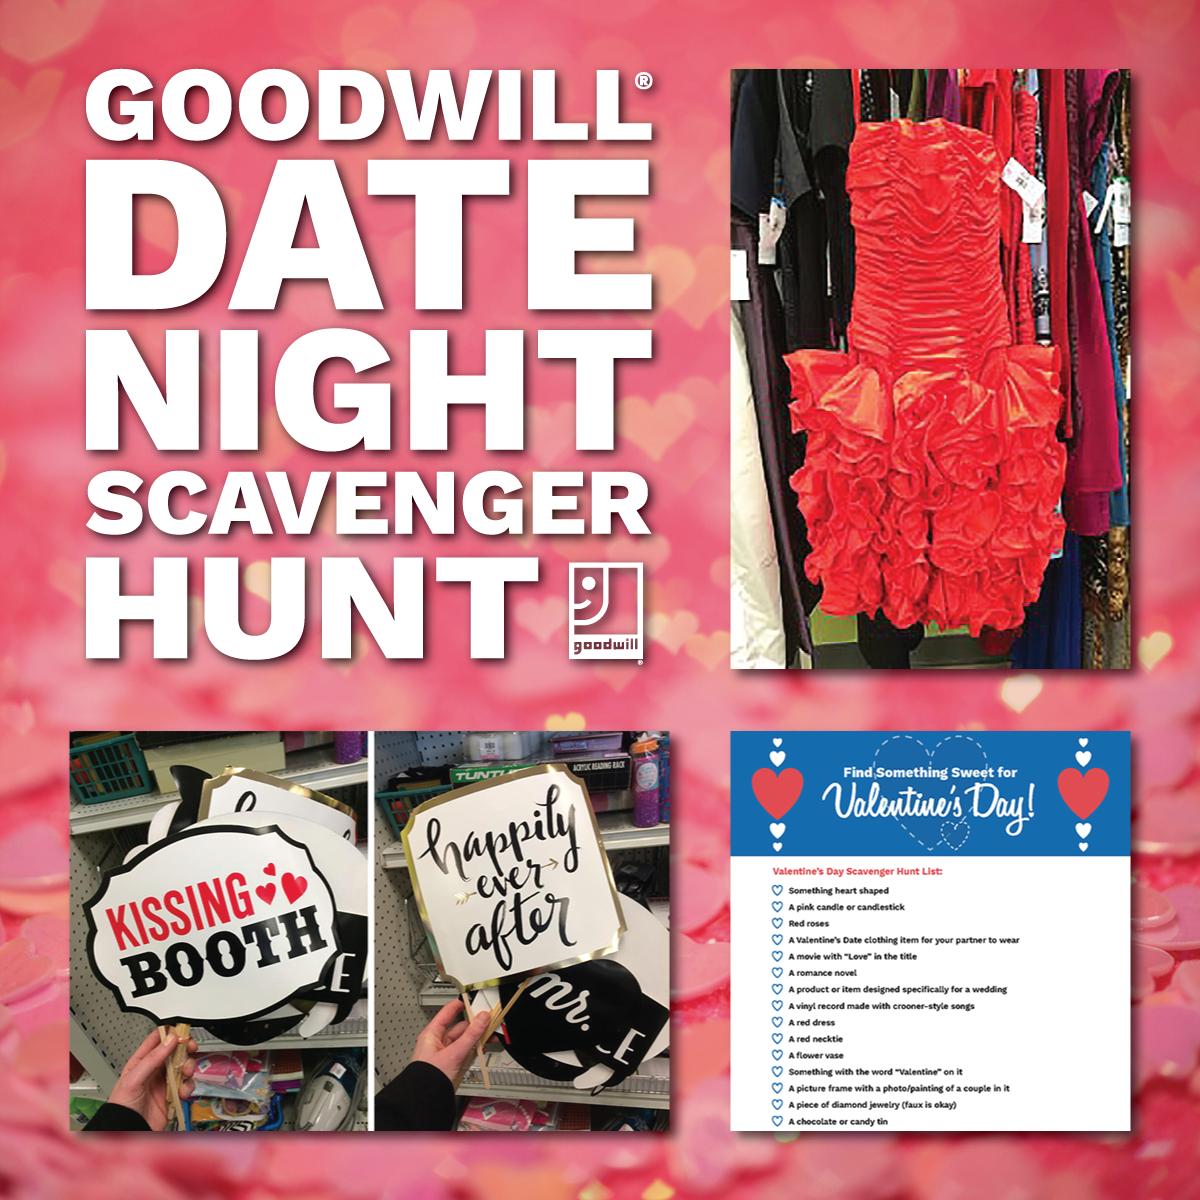 Goodwill Date Night Scavenger Hunt